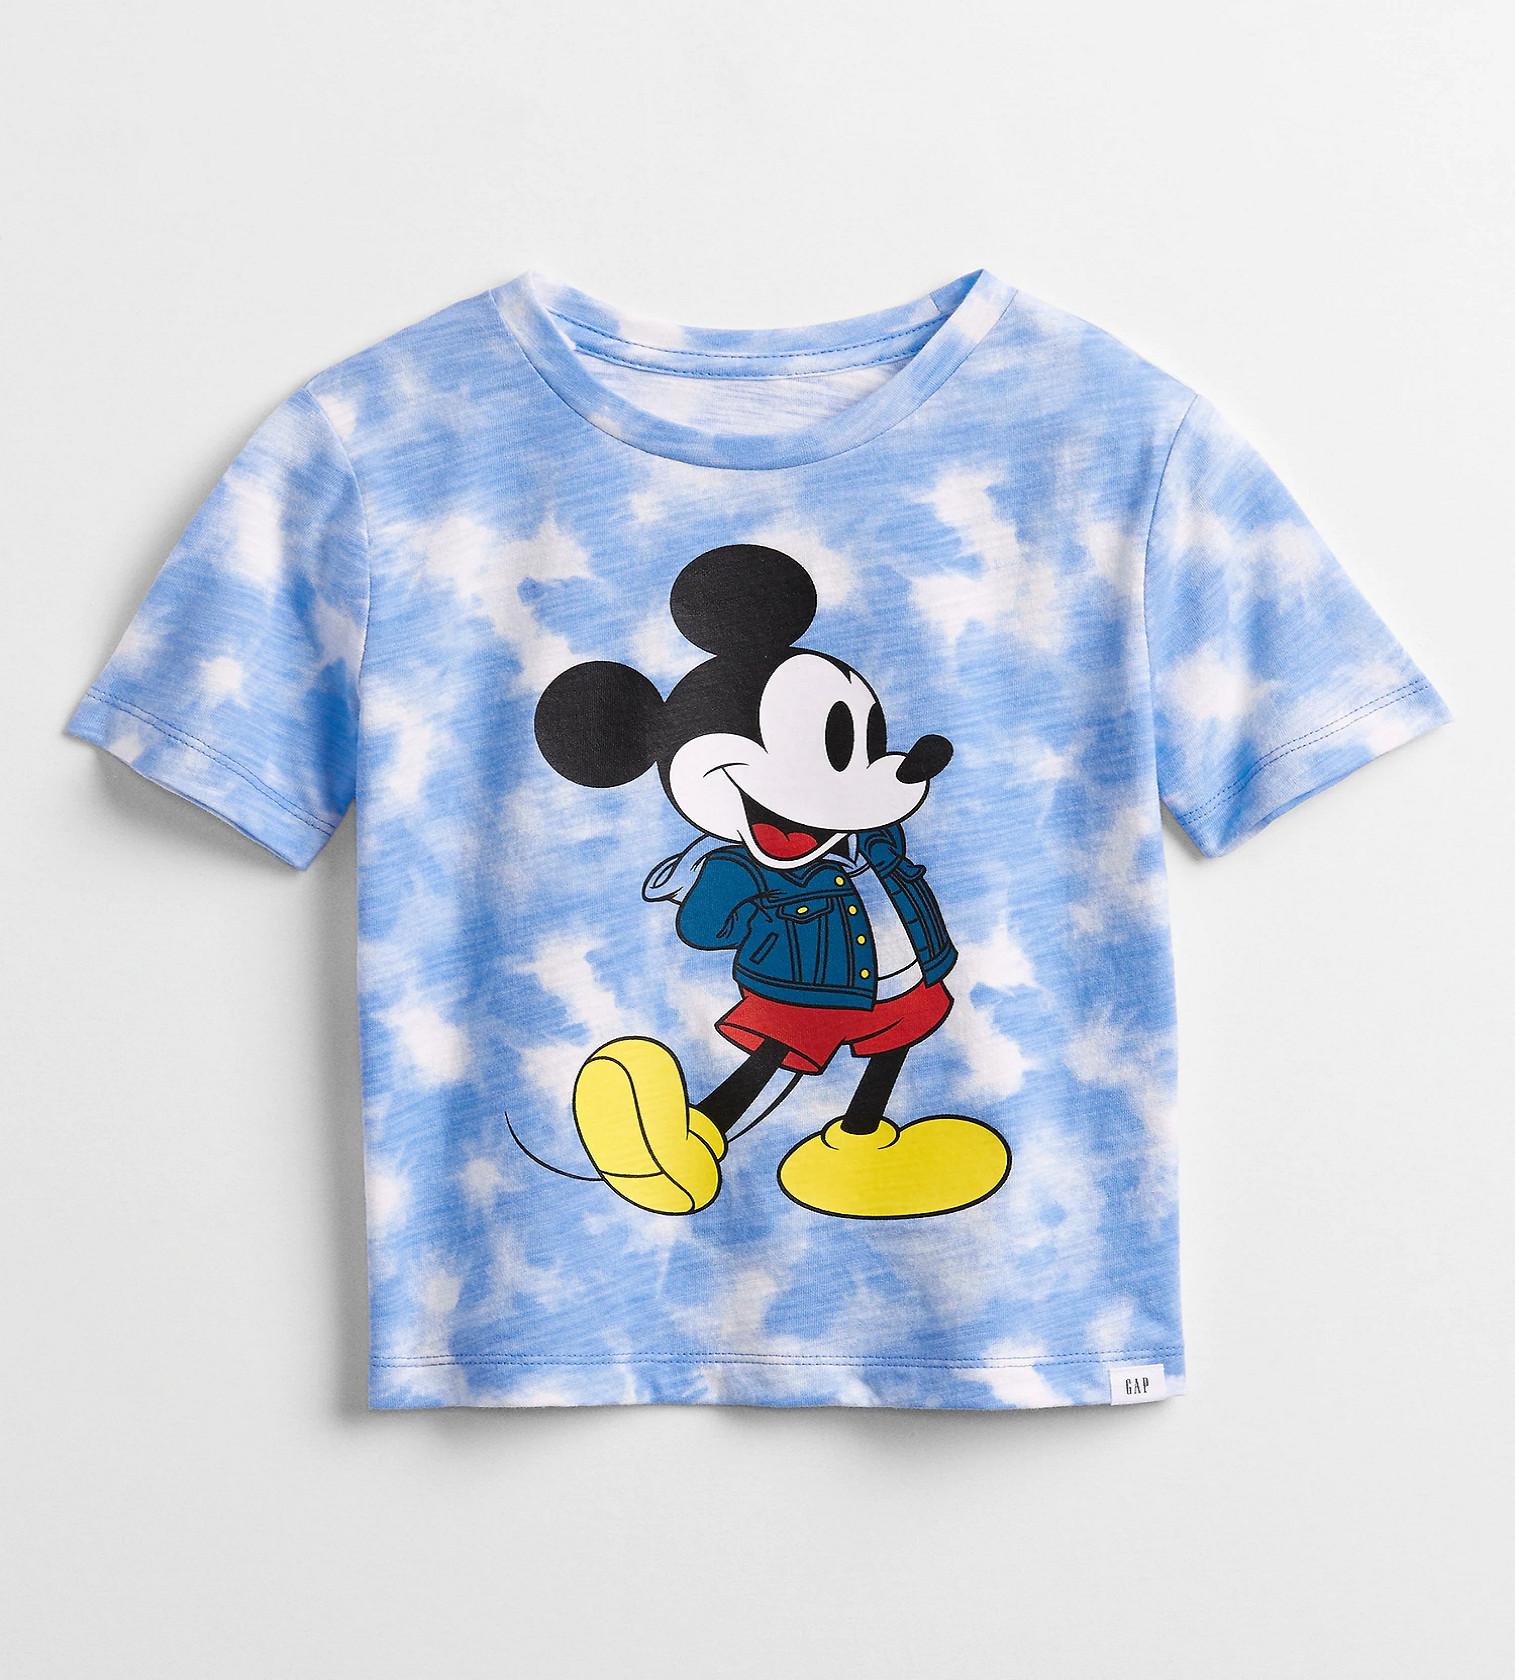 Купити Футболка Gap Disney Mickey Mouse blue tie dye - фото 1